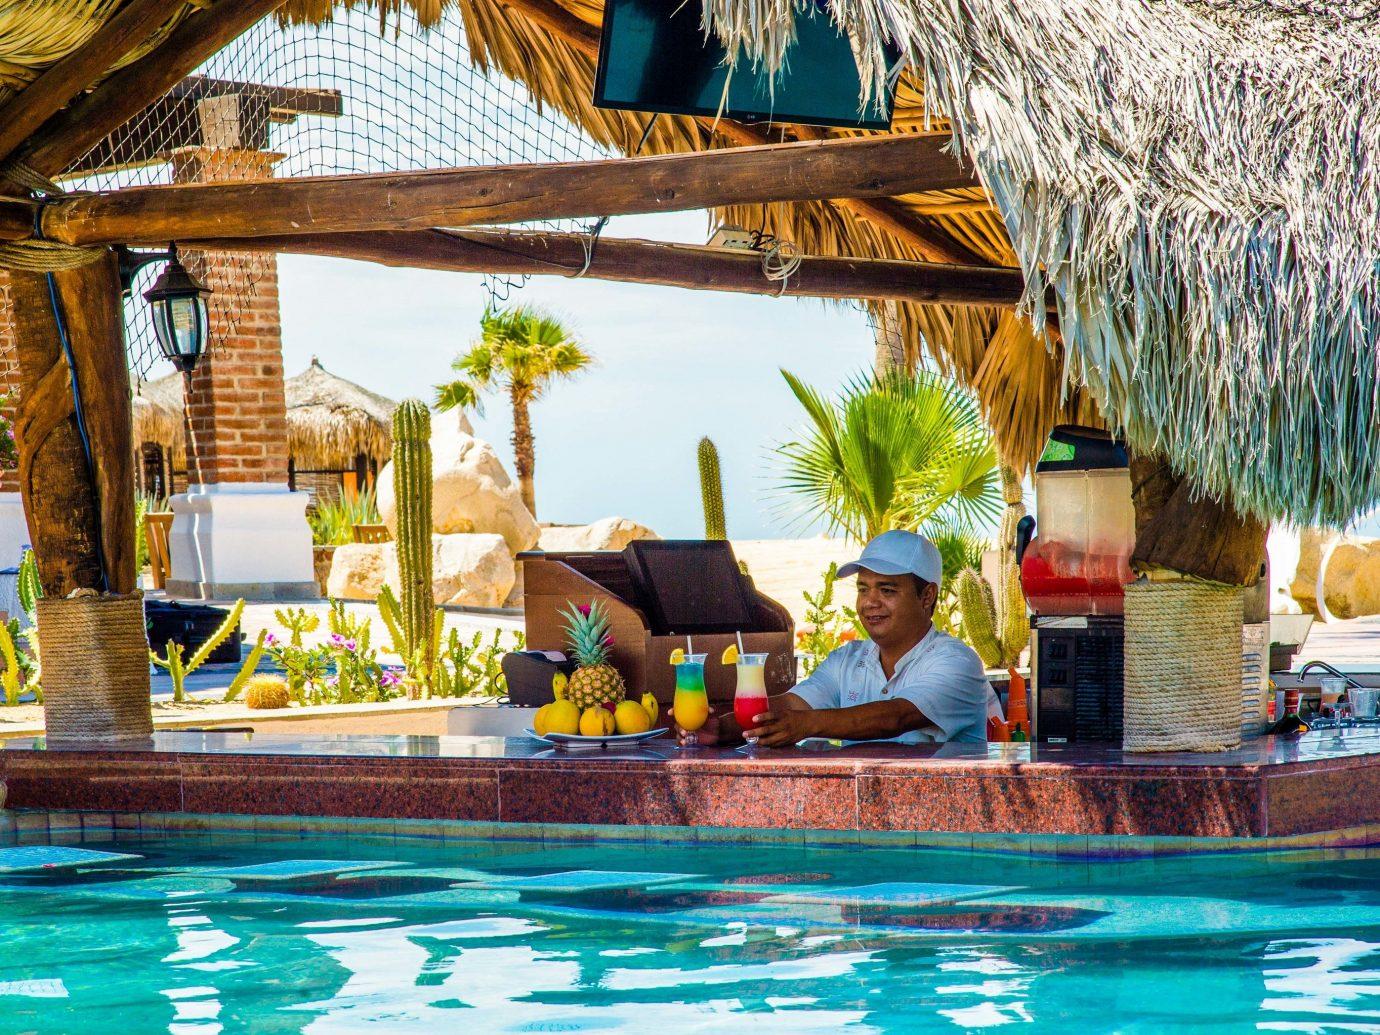 Budget Hotels water leisure swimming pool Resort vacation tourism amusement park estate Water park